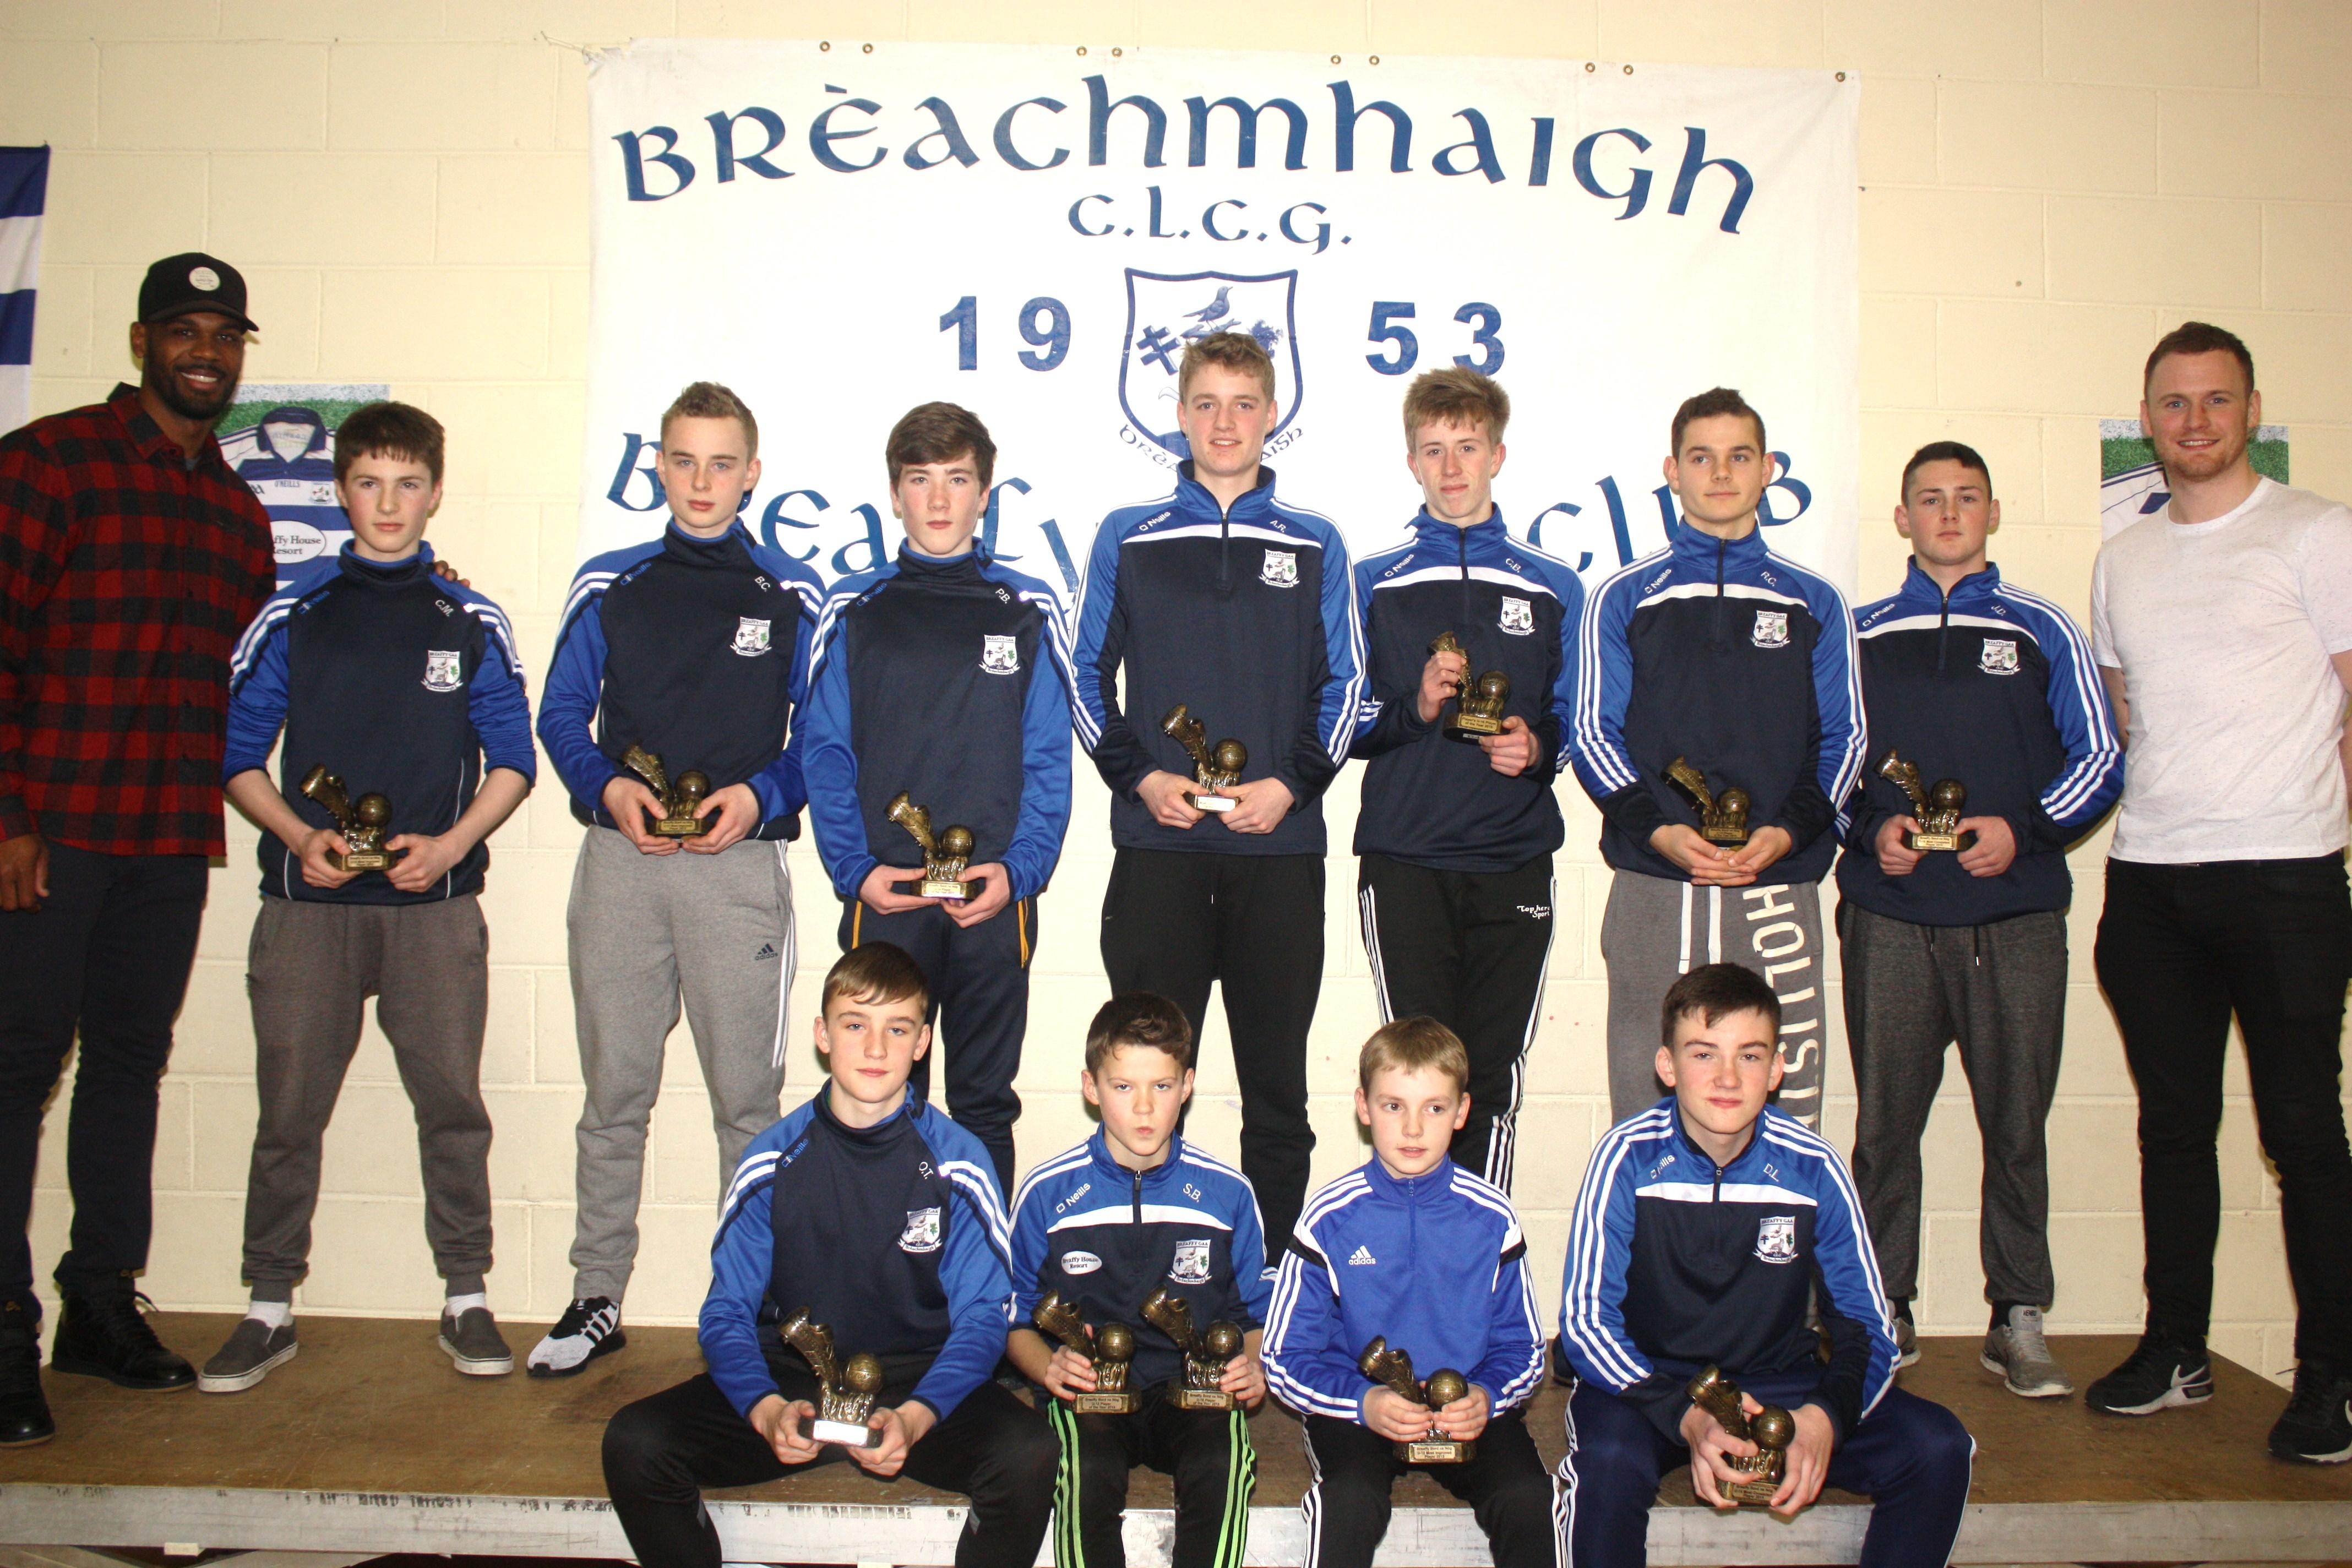 Presentation: Gaelic football, the most prestigious